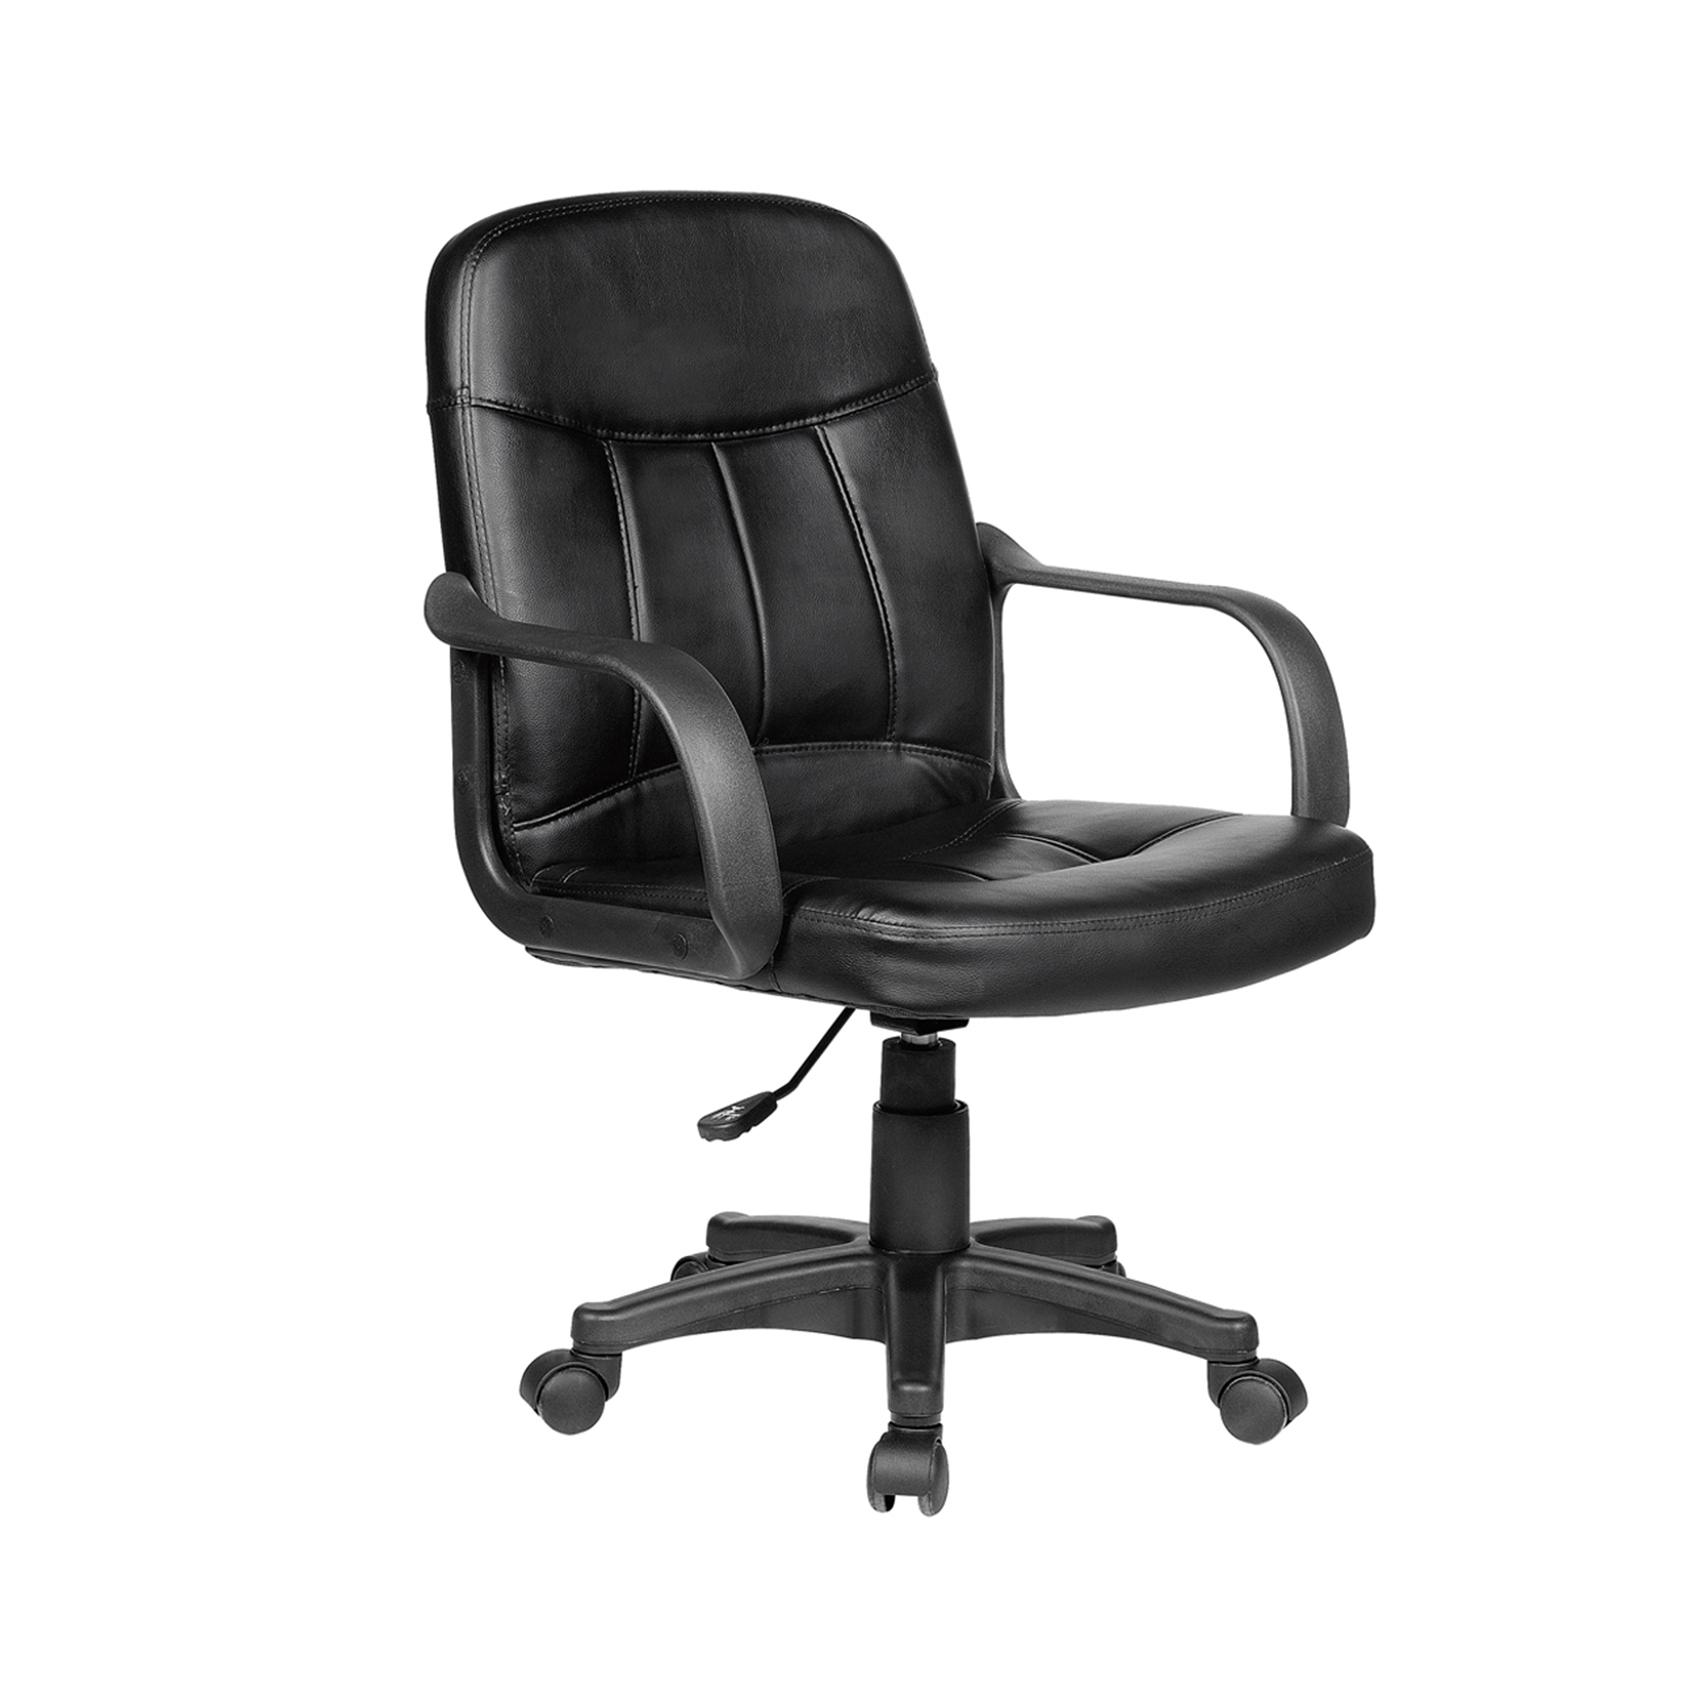 leather office chairs australia chair lift photo frame executive premium pu faux computer